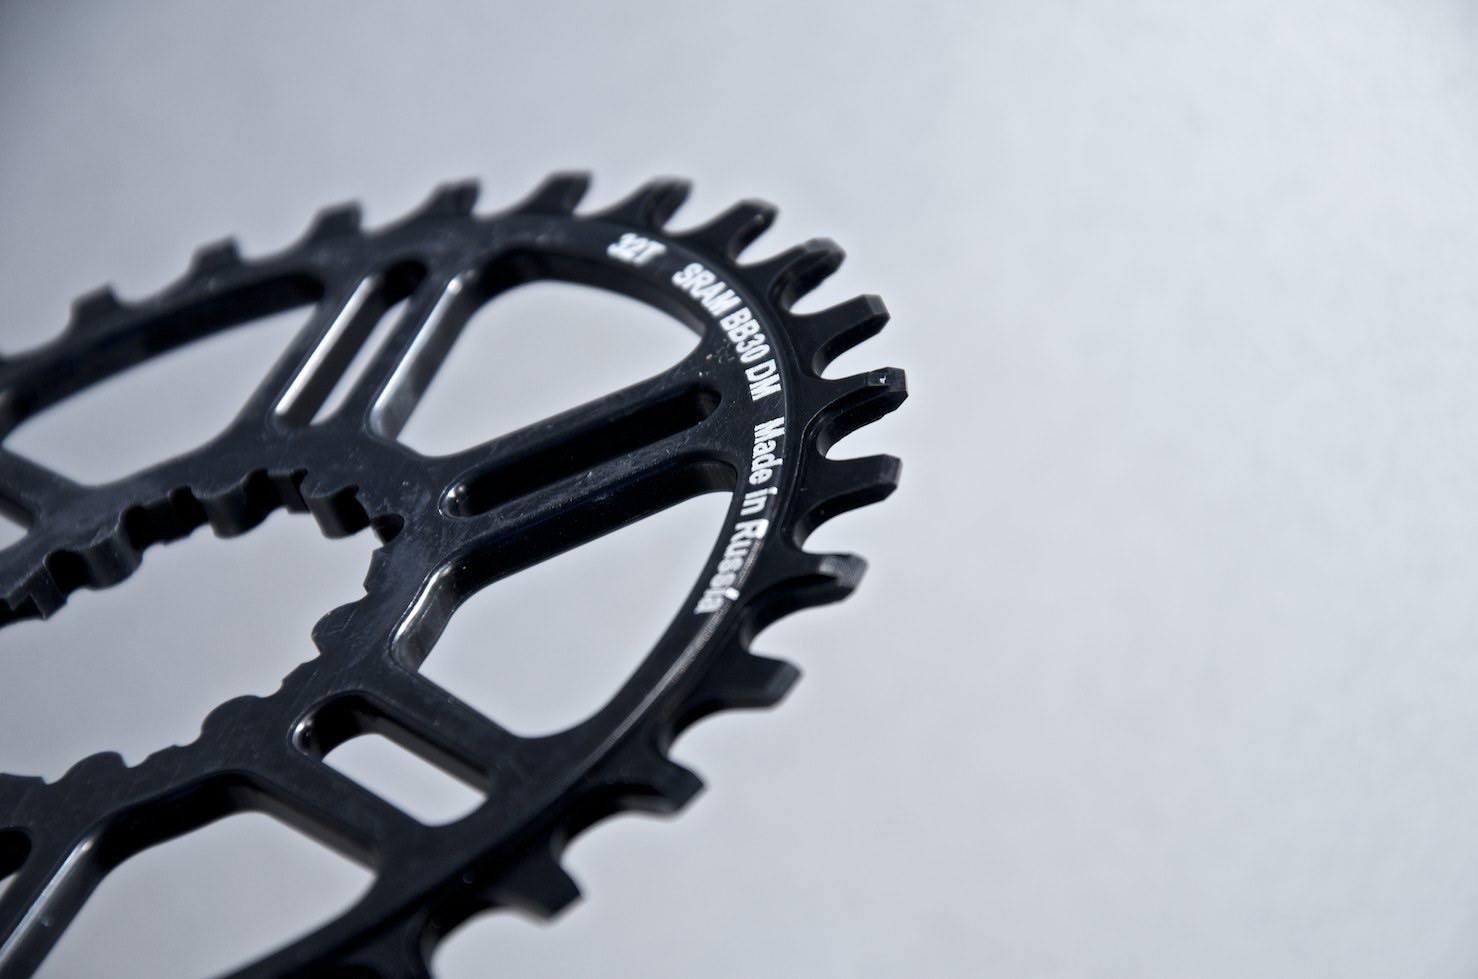 профиль зубов звезды BikeTrip Narrow wide